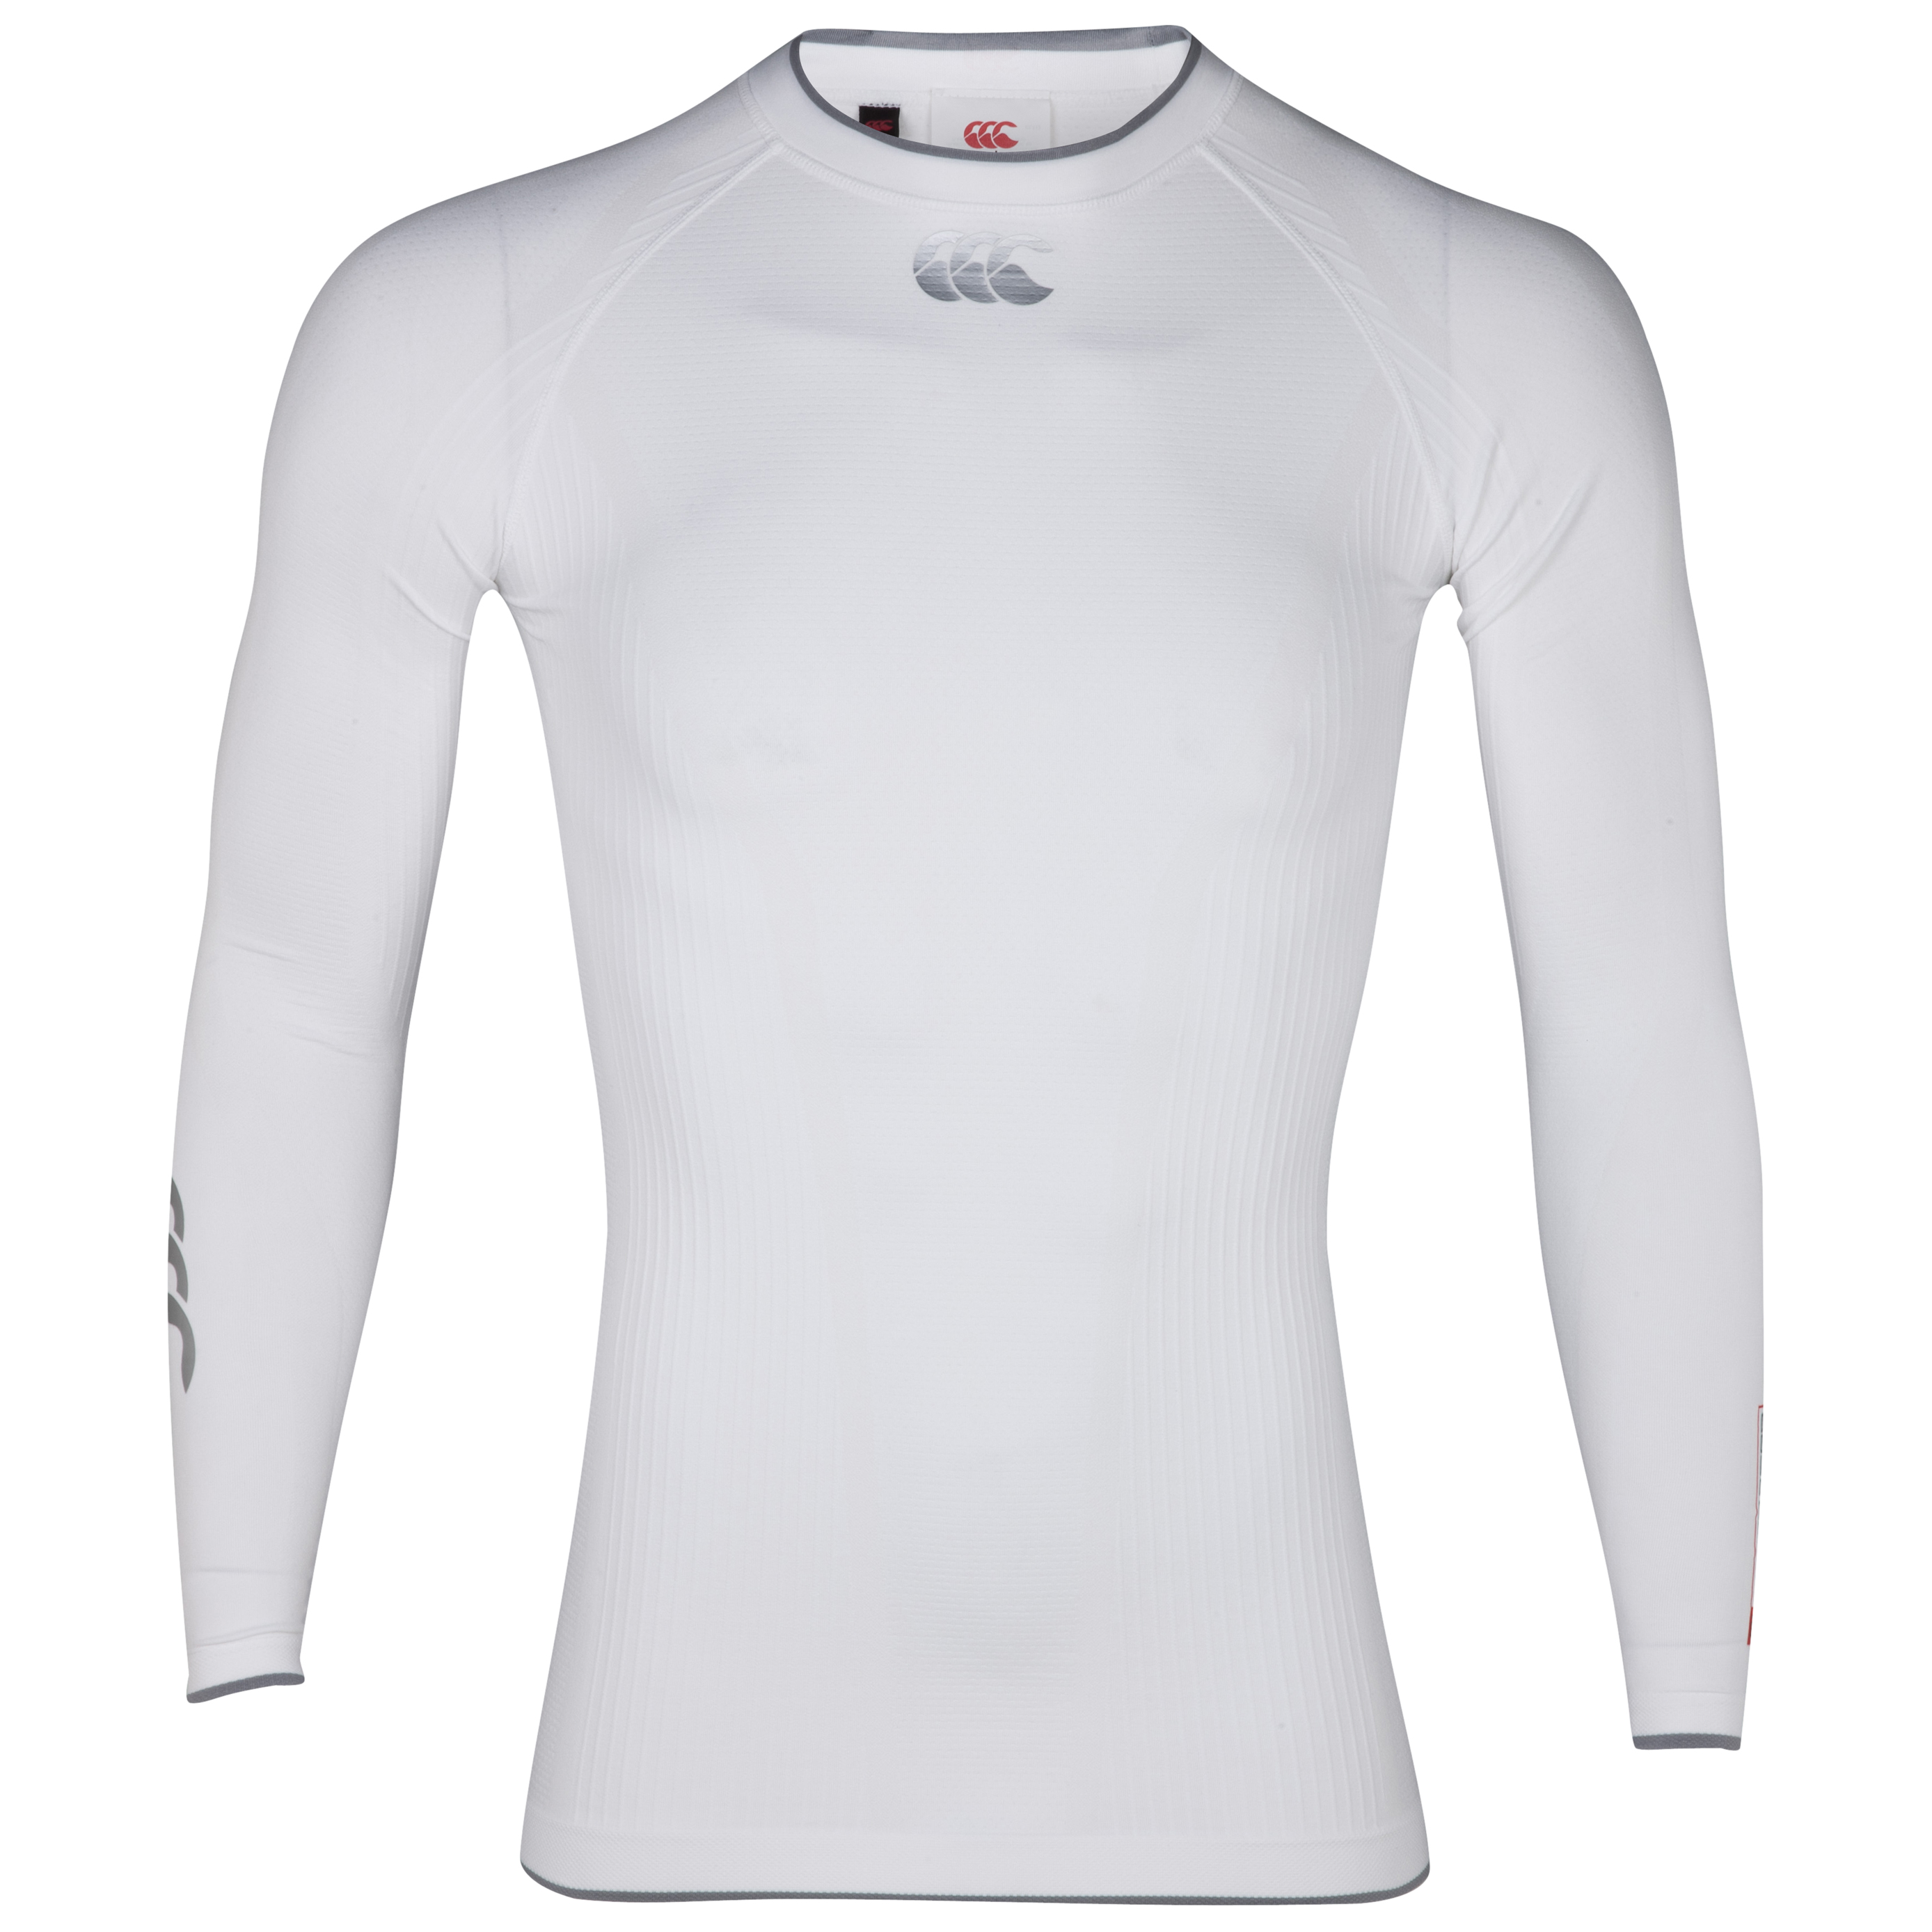 Canterbury iD Top - Long Sleeve - White/Black